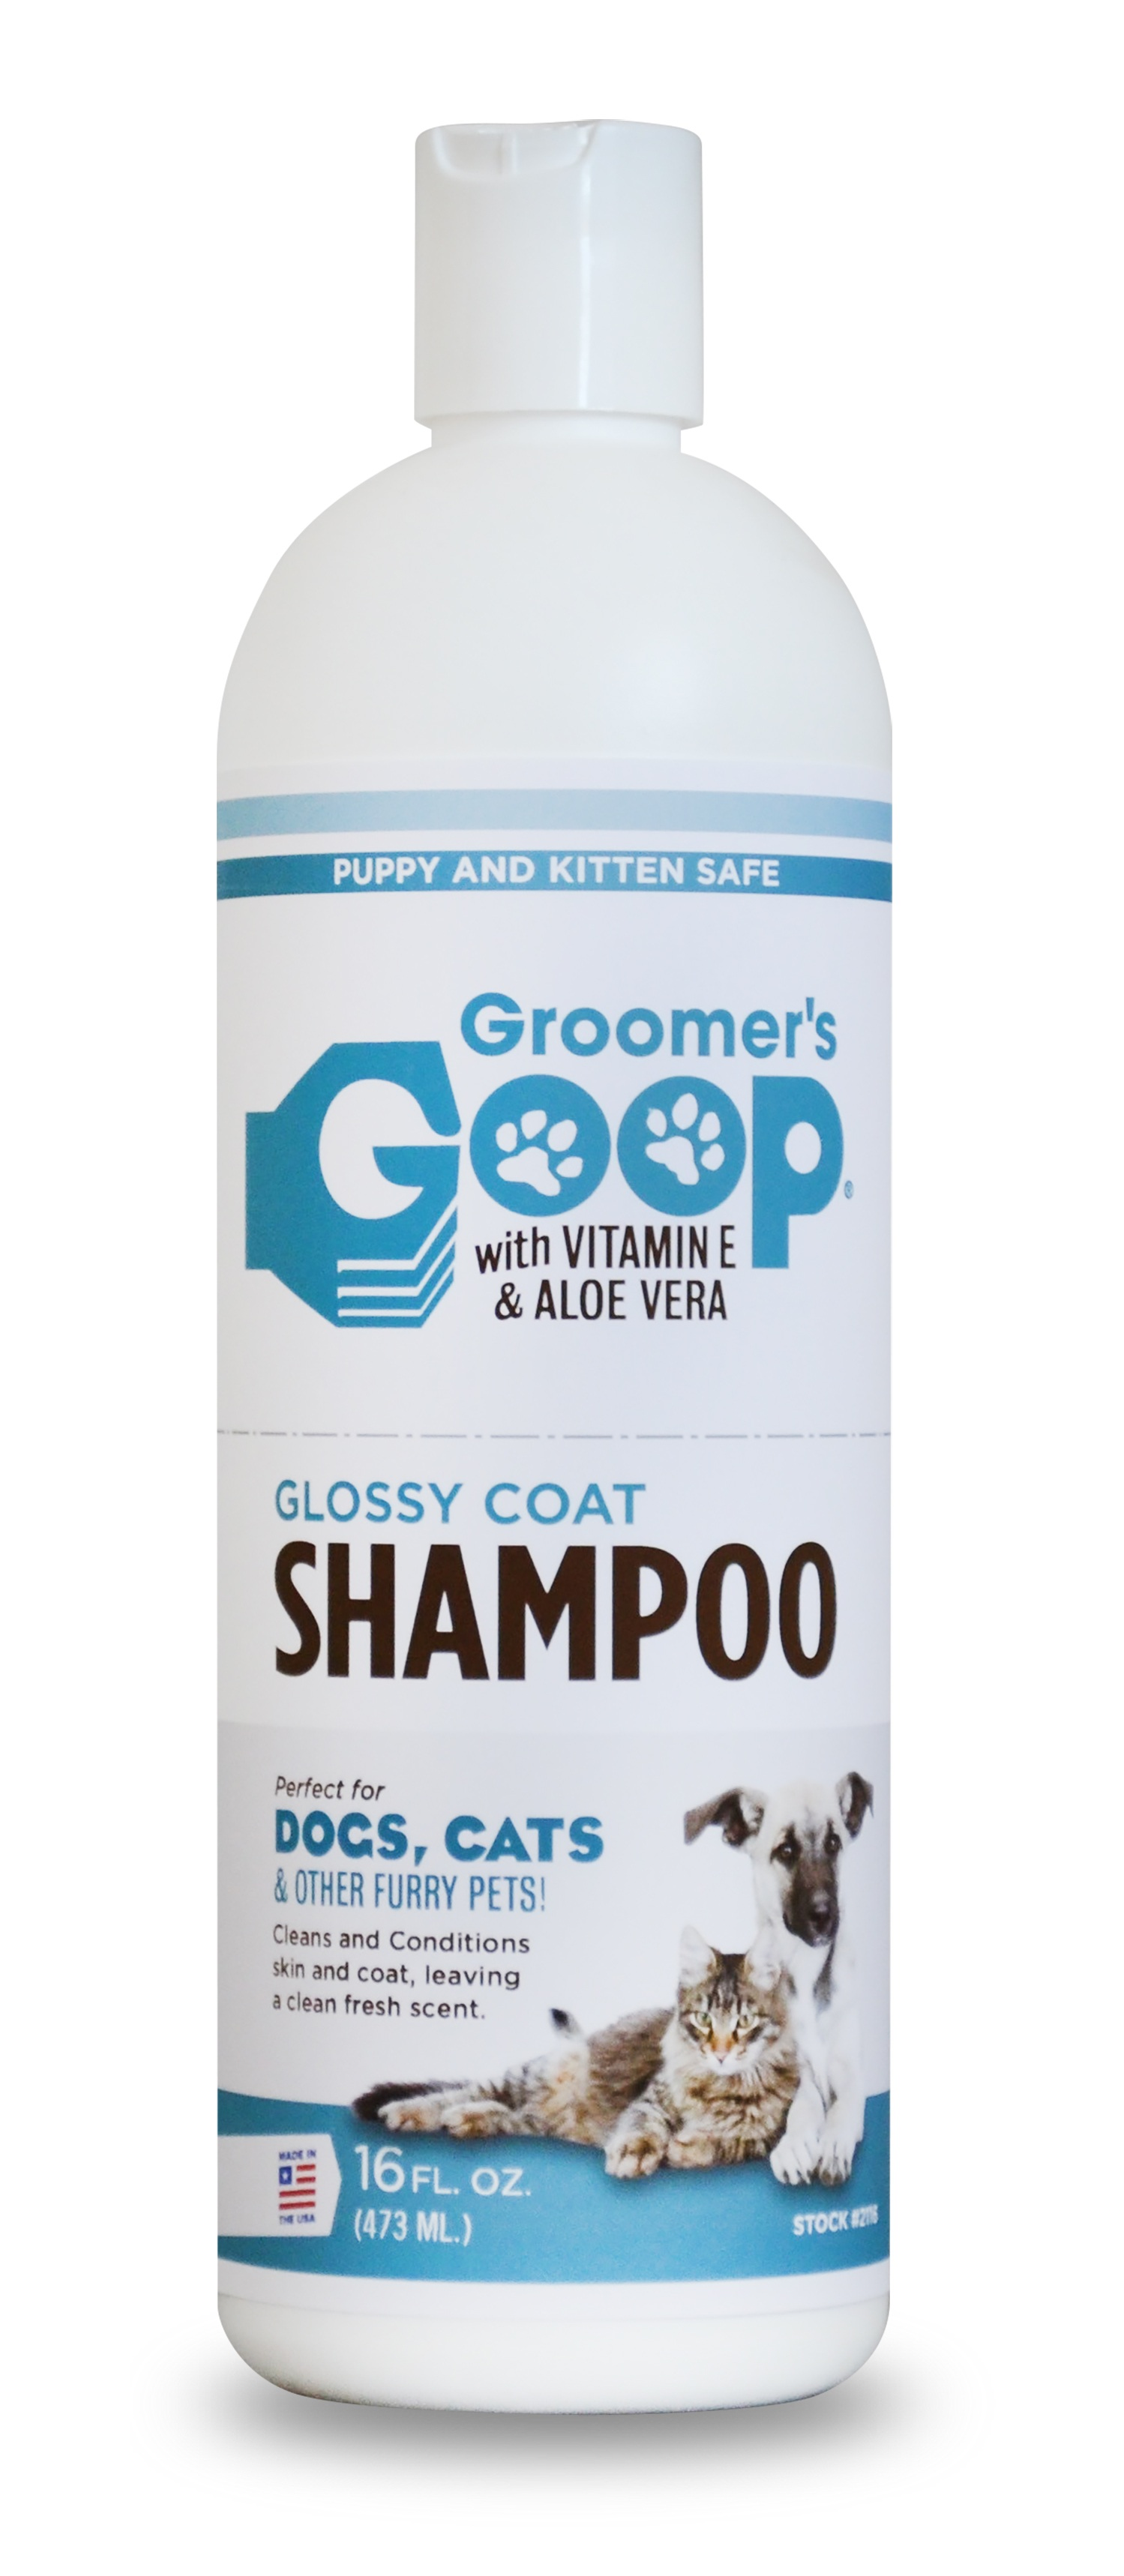 Moms-Goop-Groomers-216-Shampoo16oz.jpg